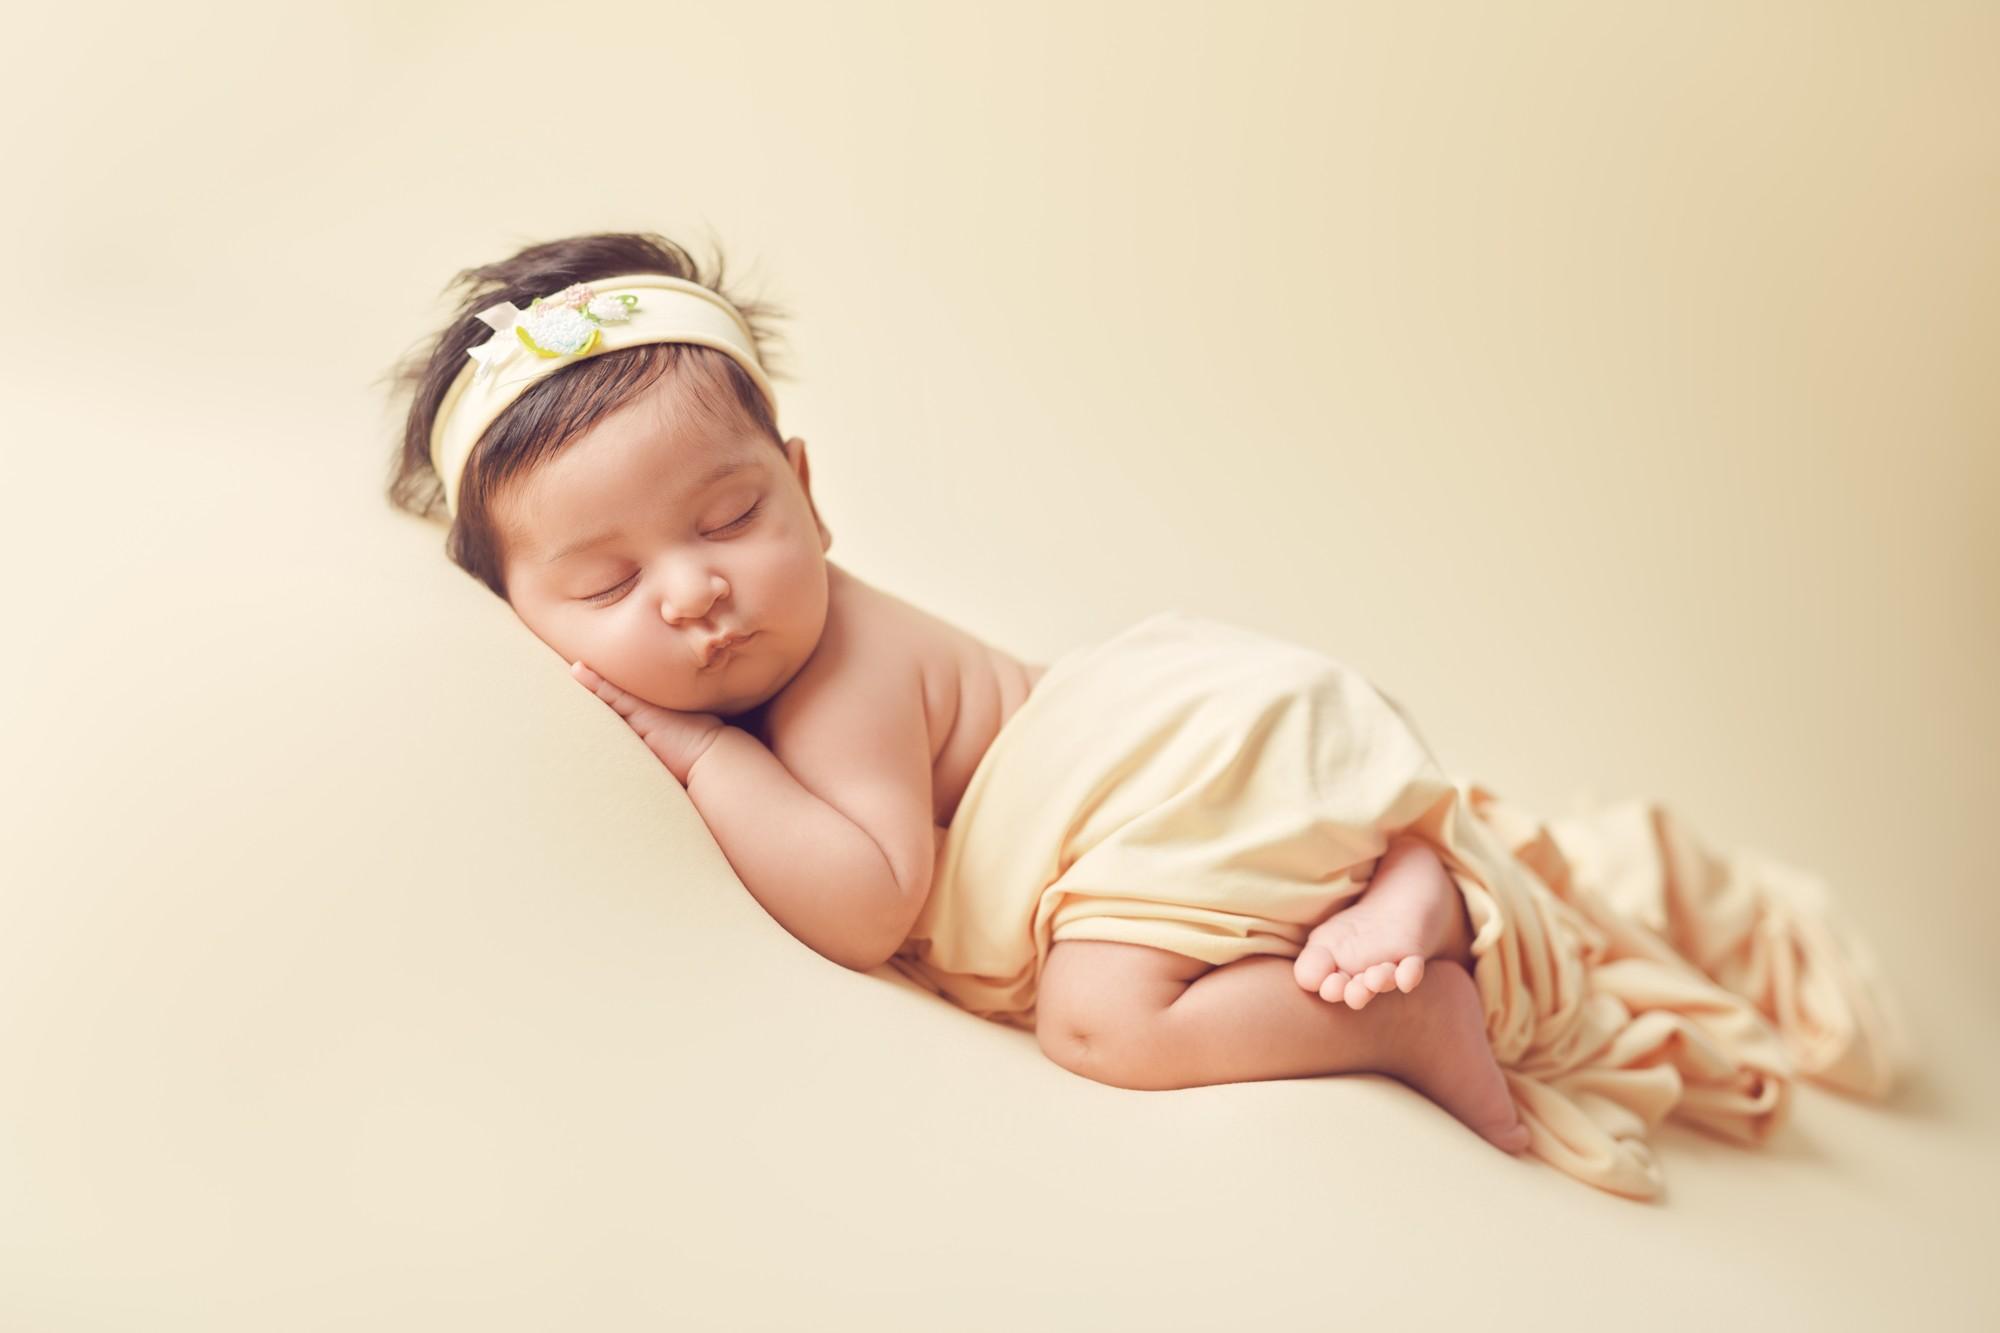 EM4A7955-Newborn Estudio Palma de Mallorcazoek tienda decoracion fotografia estudio